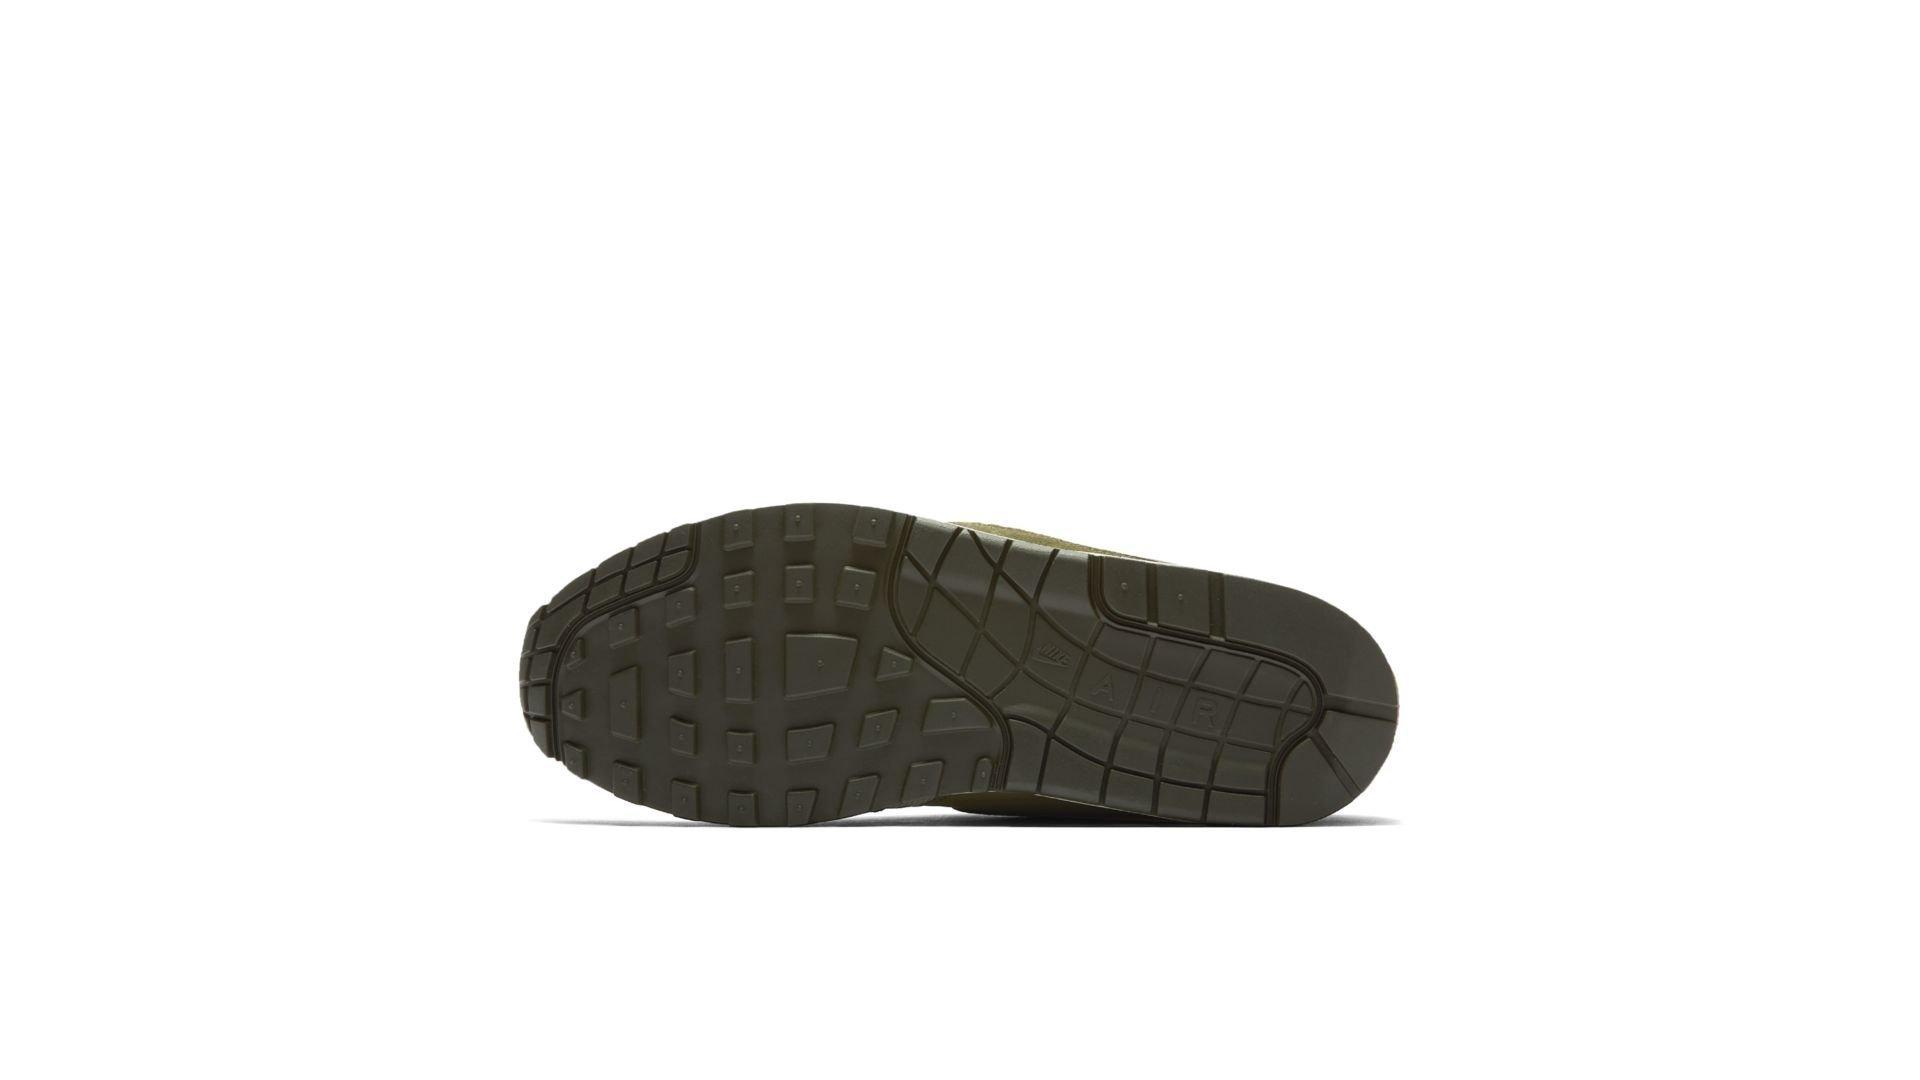 Nike Air Max 1 'Medium Olive' (AH8145-201)